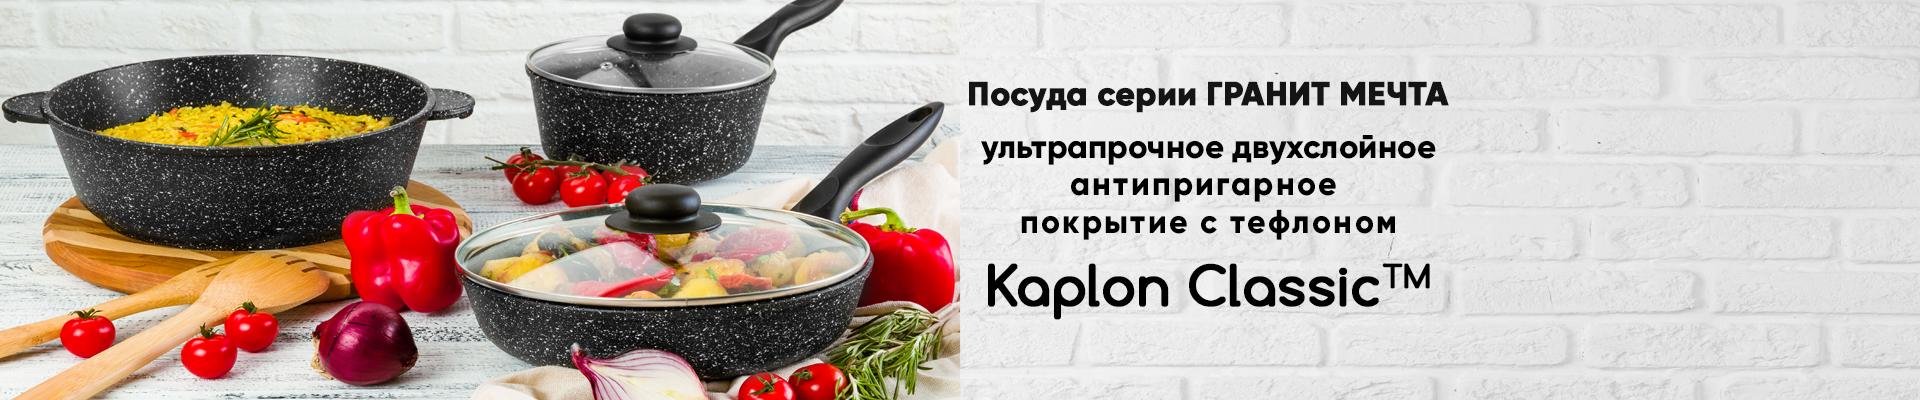 Kaplon Classic